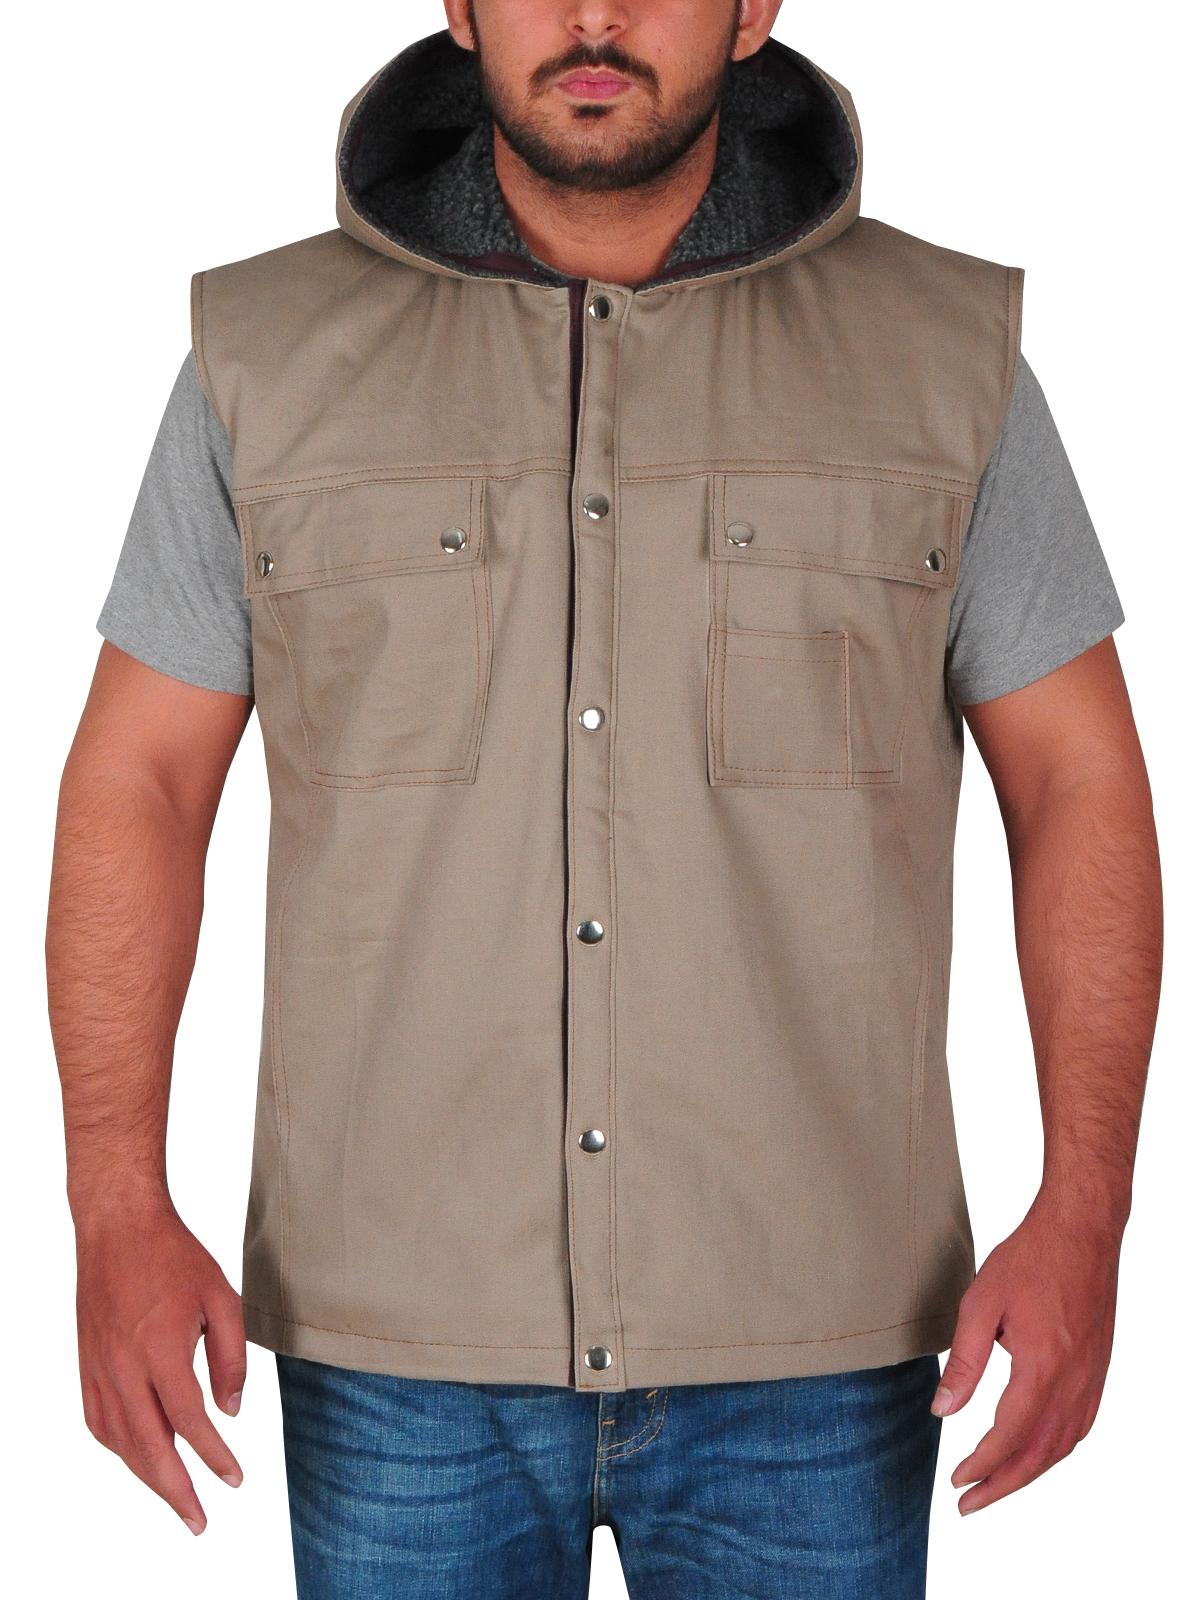 WWE Superstar Dave Bautista Light Brown Cotton Hooded Vest